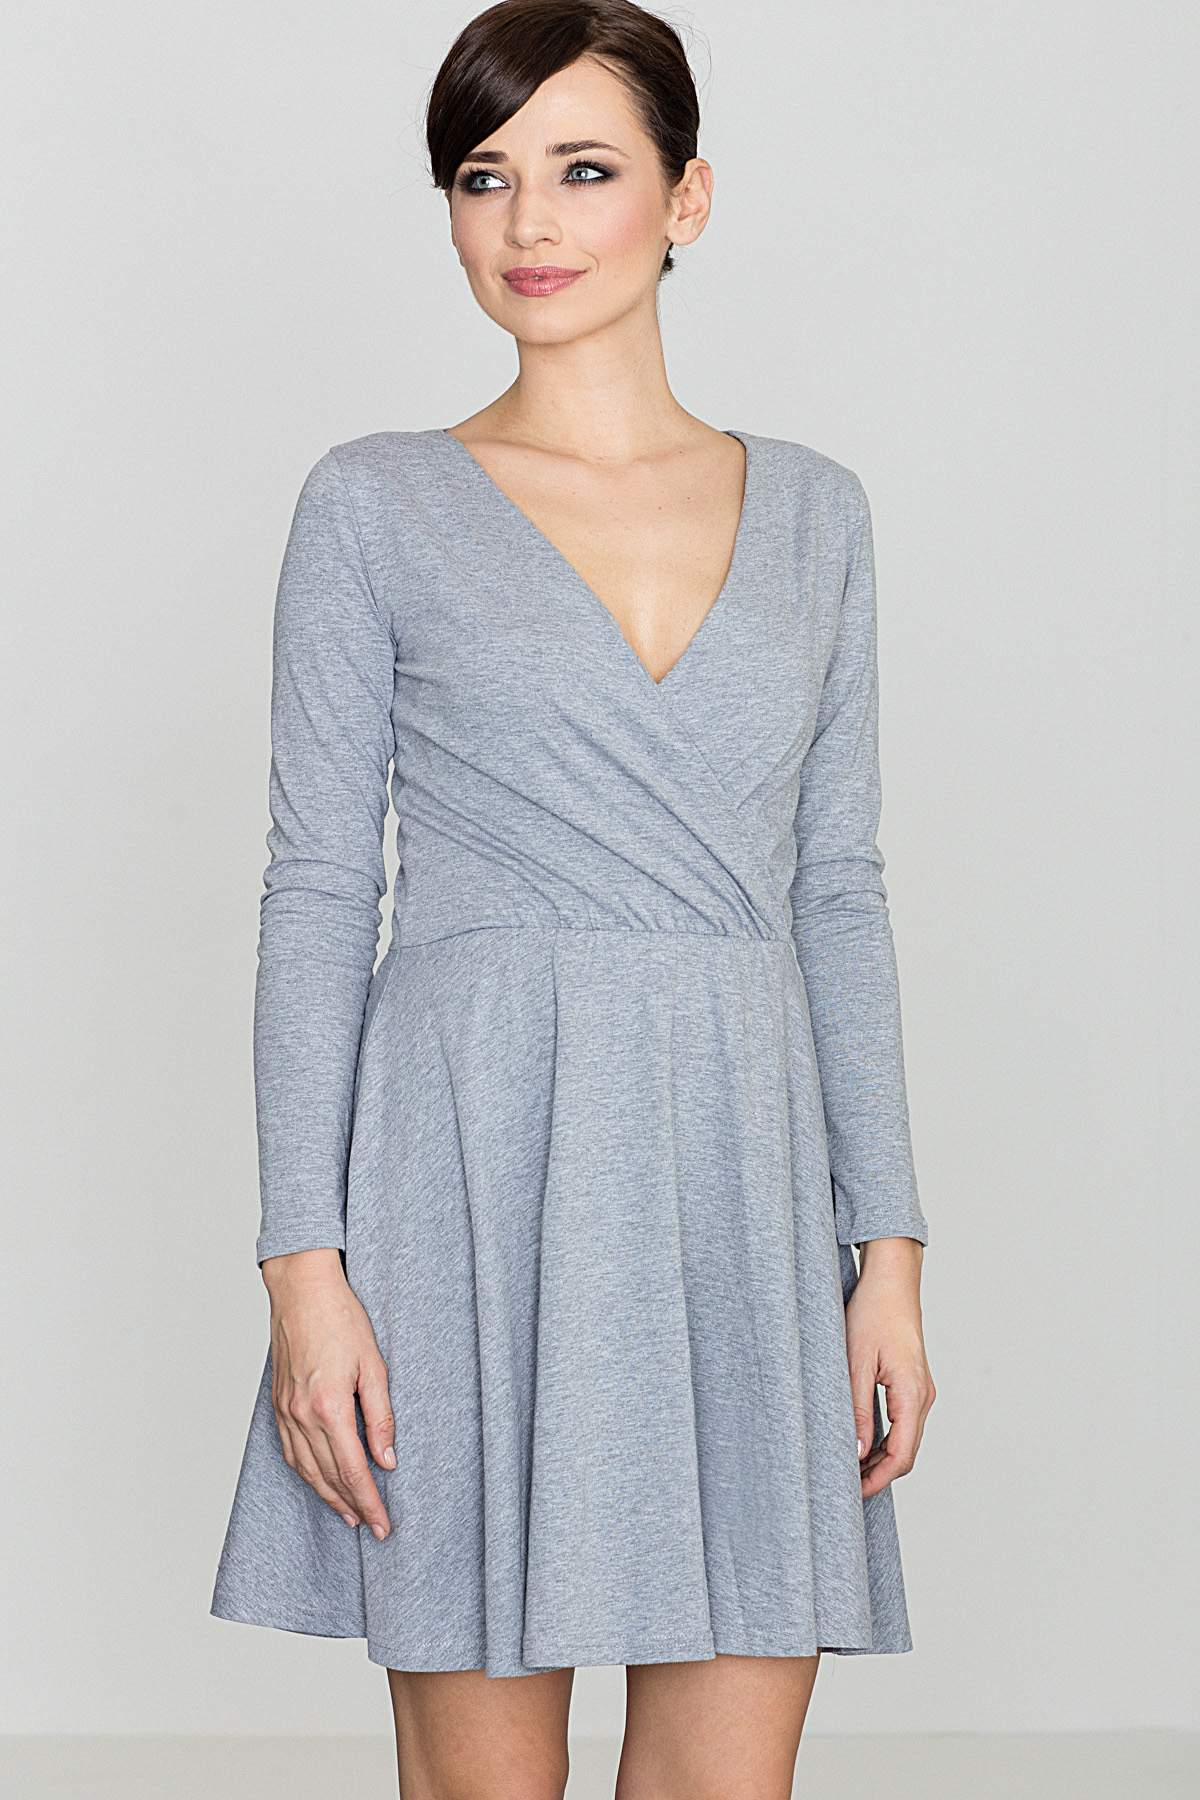 KATRUS φορεμα κρουαζε